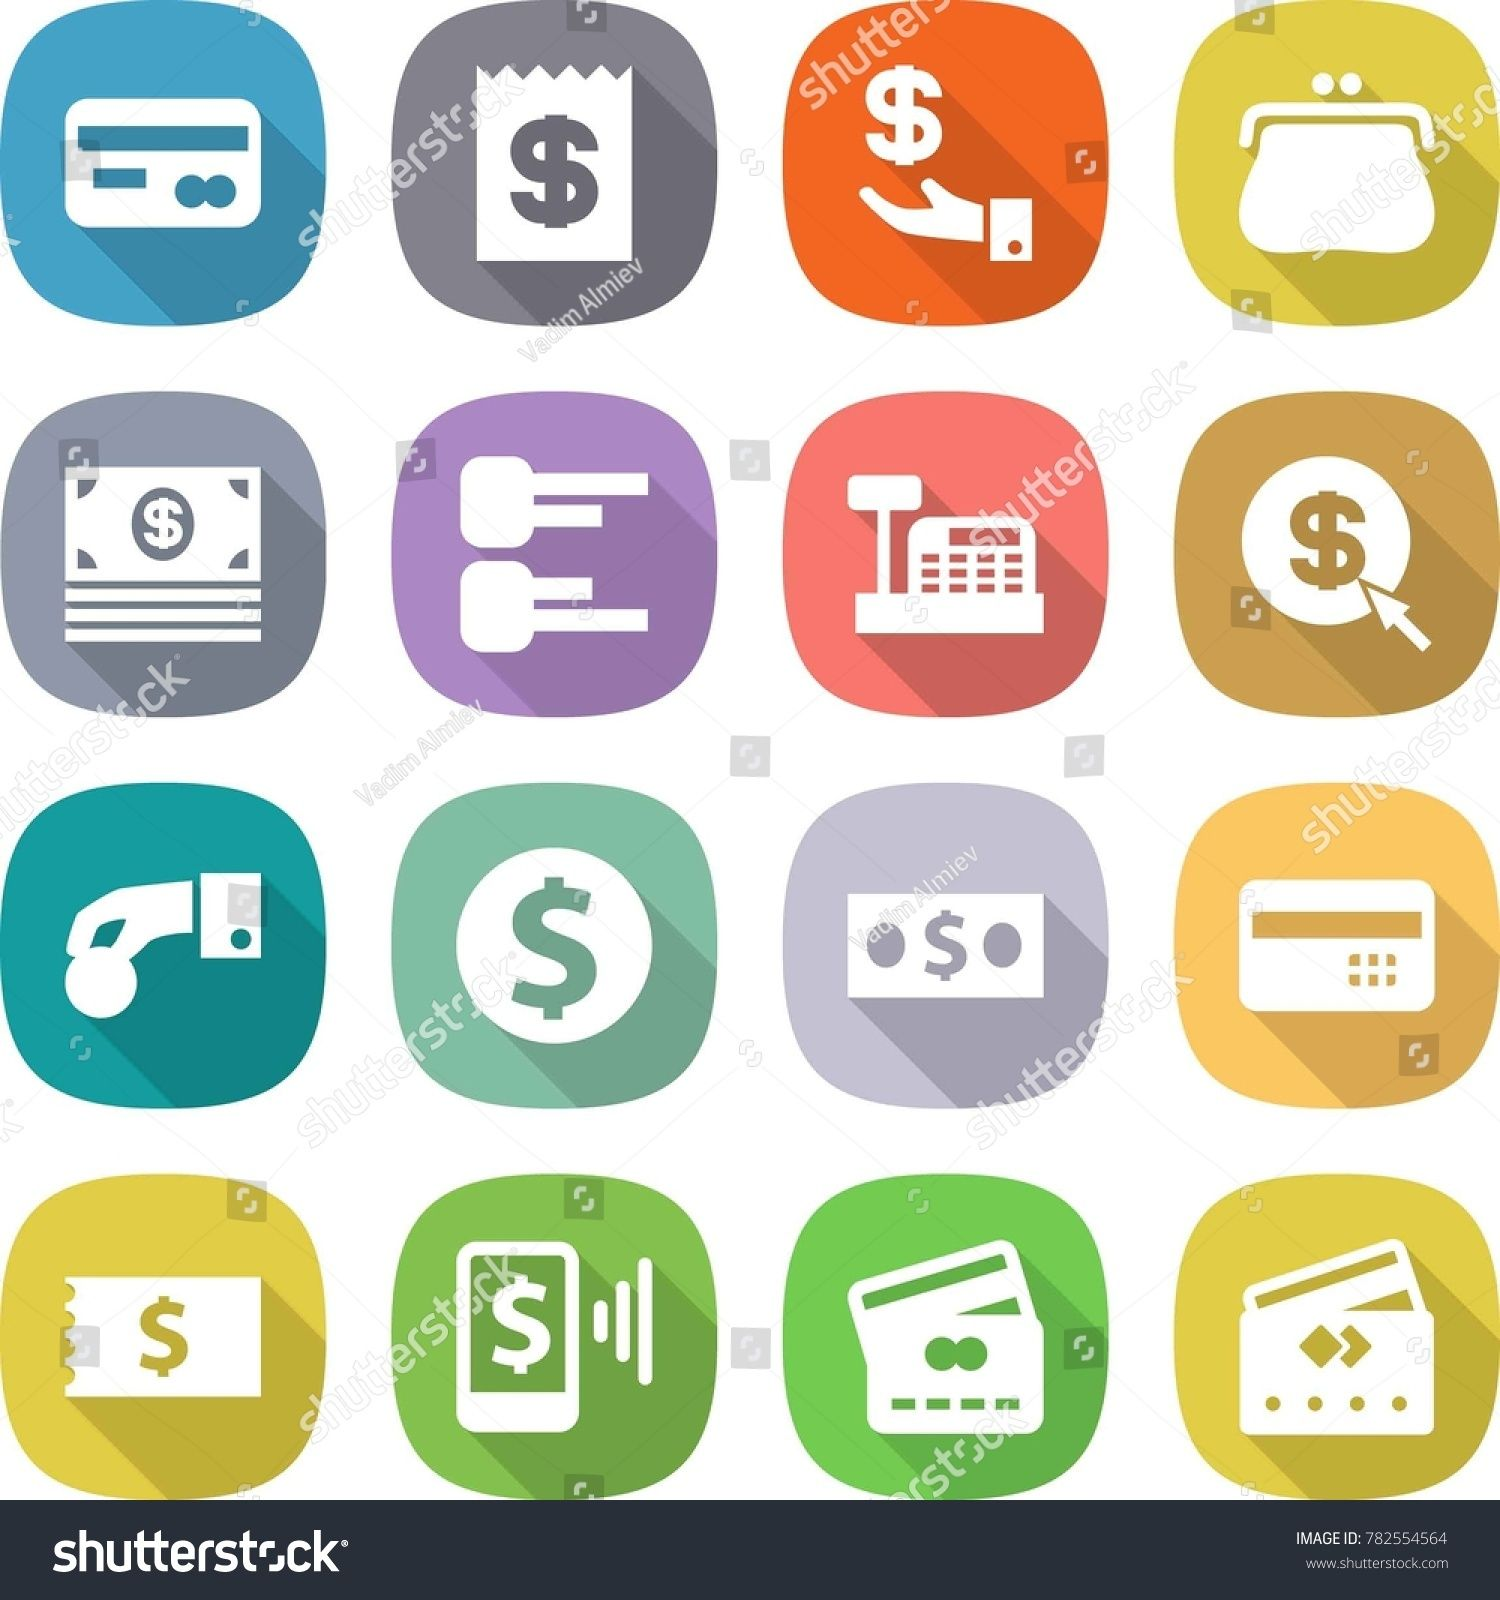 Flat Vector Icon Set Card Vector Receipt Investment Purse Money Diagram Cashbox Dollar Arrow Hand Sponsored Wedding Brochure Money Purse Investing